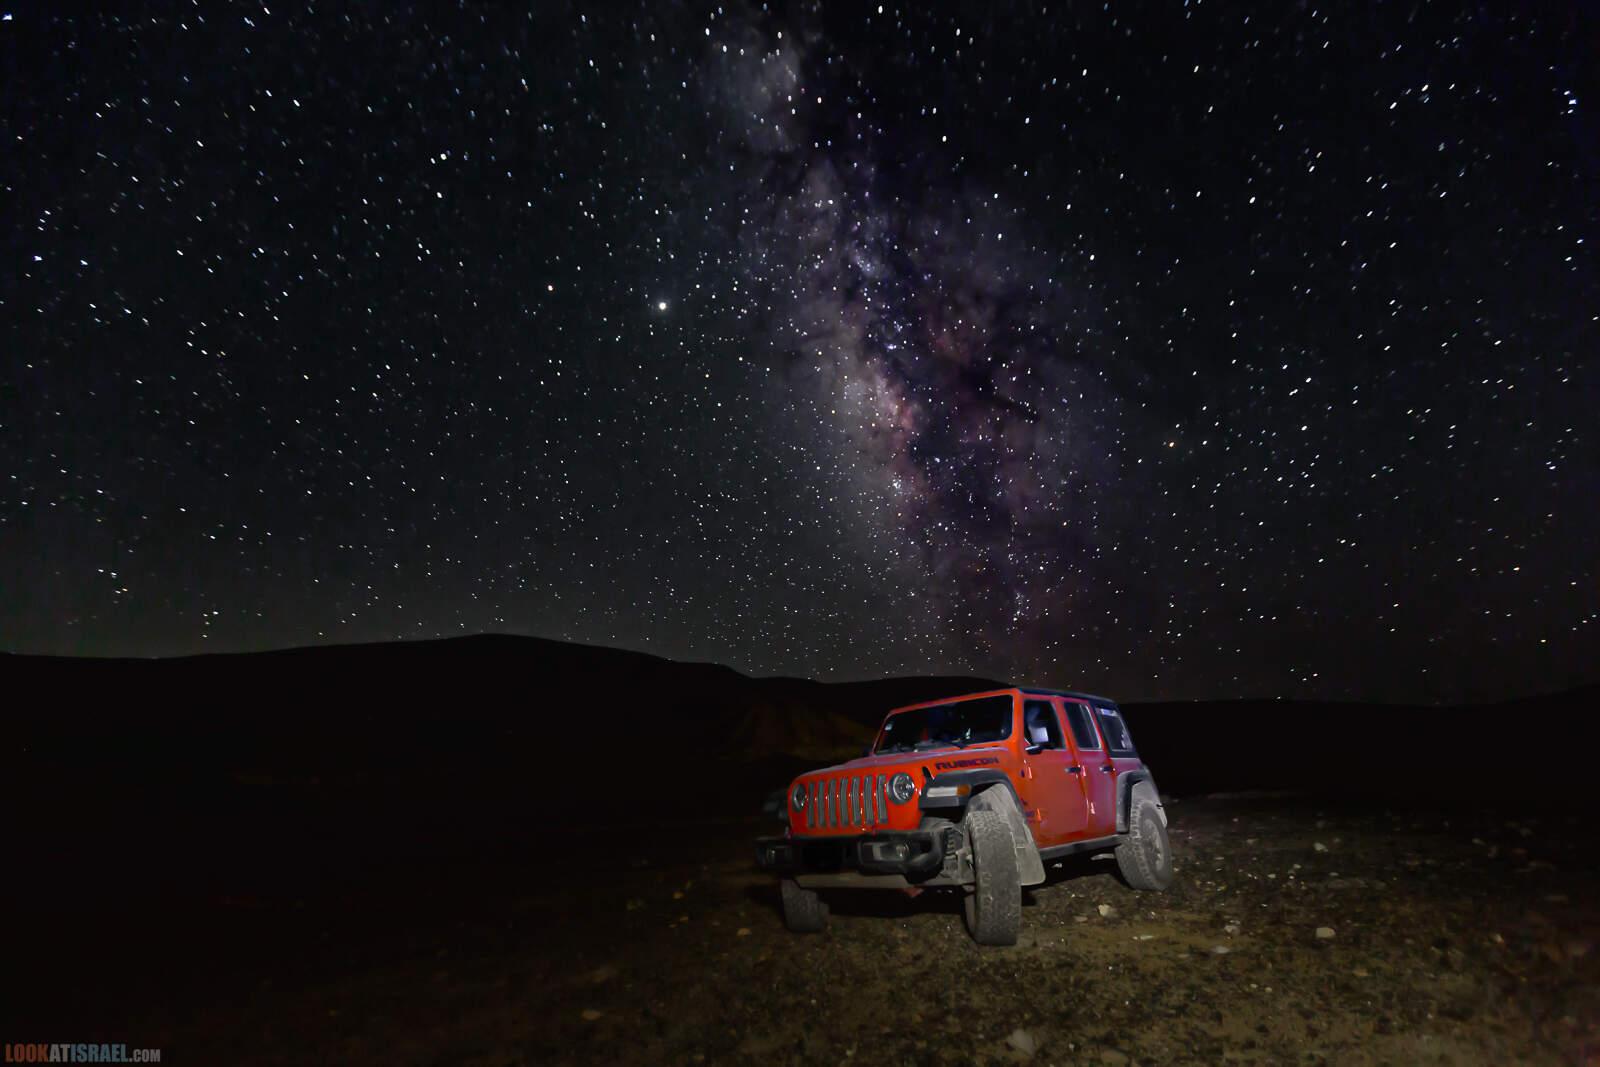 Млечный путь в пустыне, Махтеш Рамон, Израиль | Milky Way in desert, Makhtesh Ramon, Israel | שביל החלב במדבר, מכתש רמון